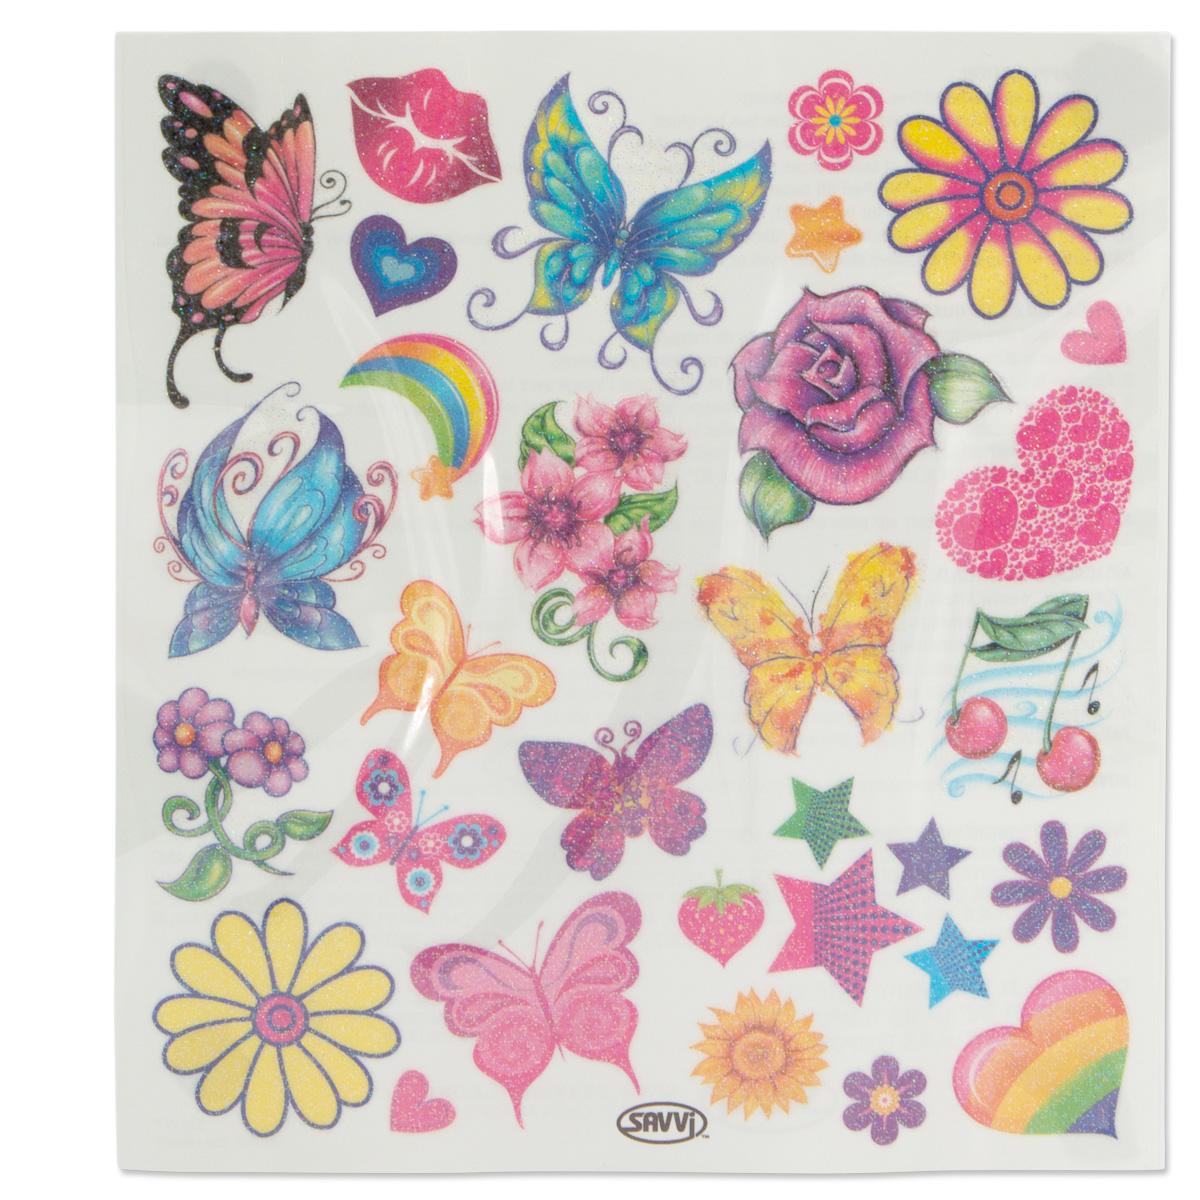 Savvi-Kids-Activity-Kit-Markers-Tattoos-Stickers-amp-More thumbnail 4